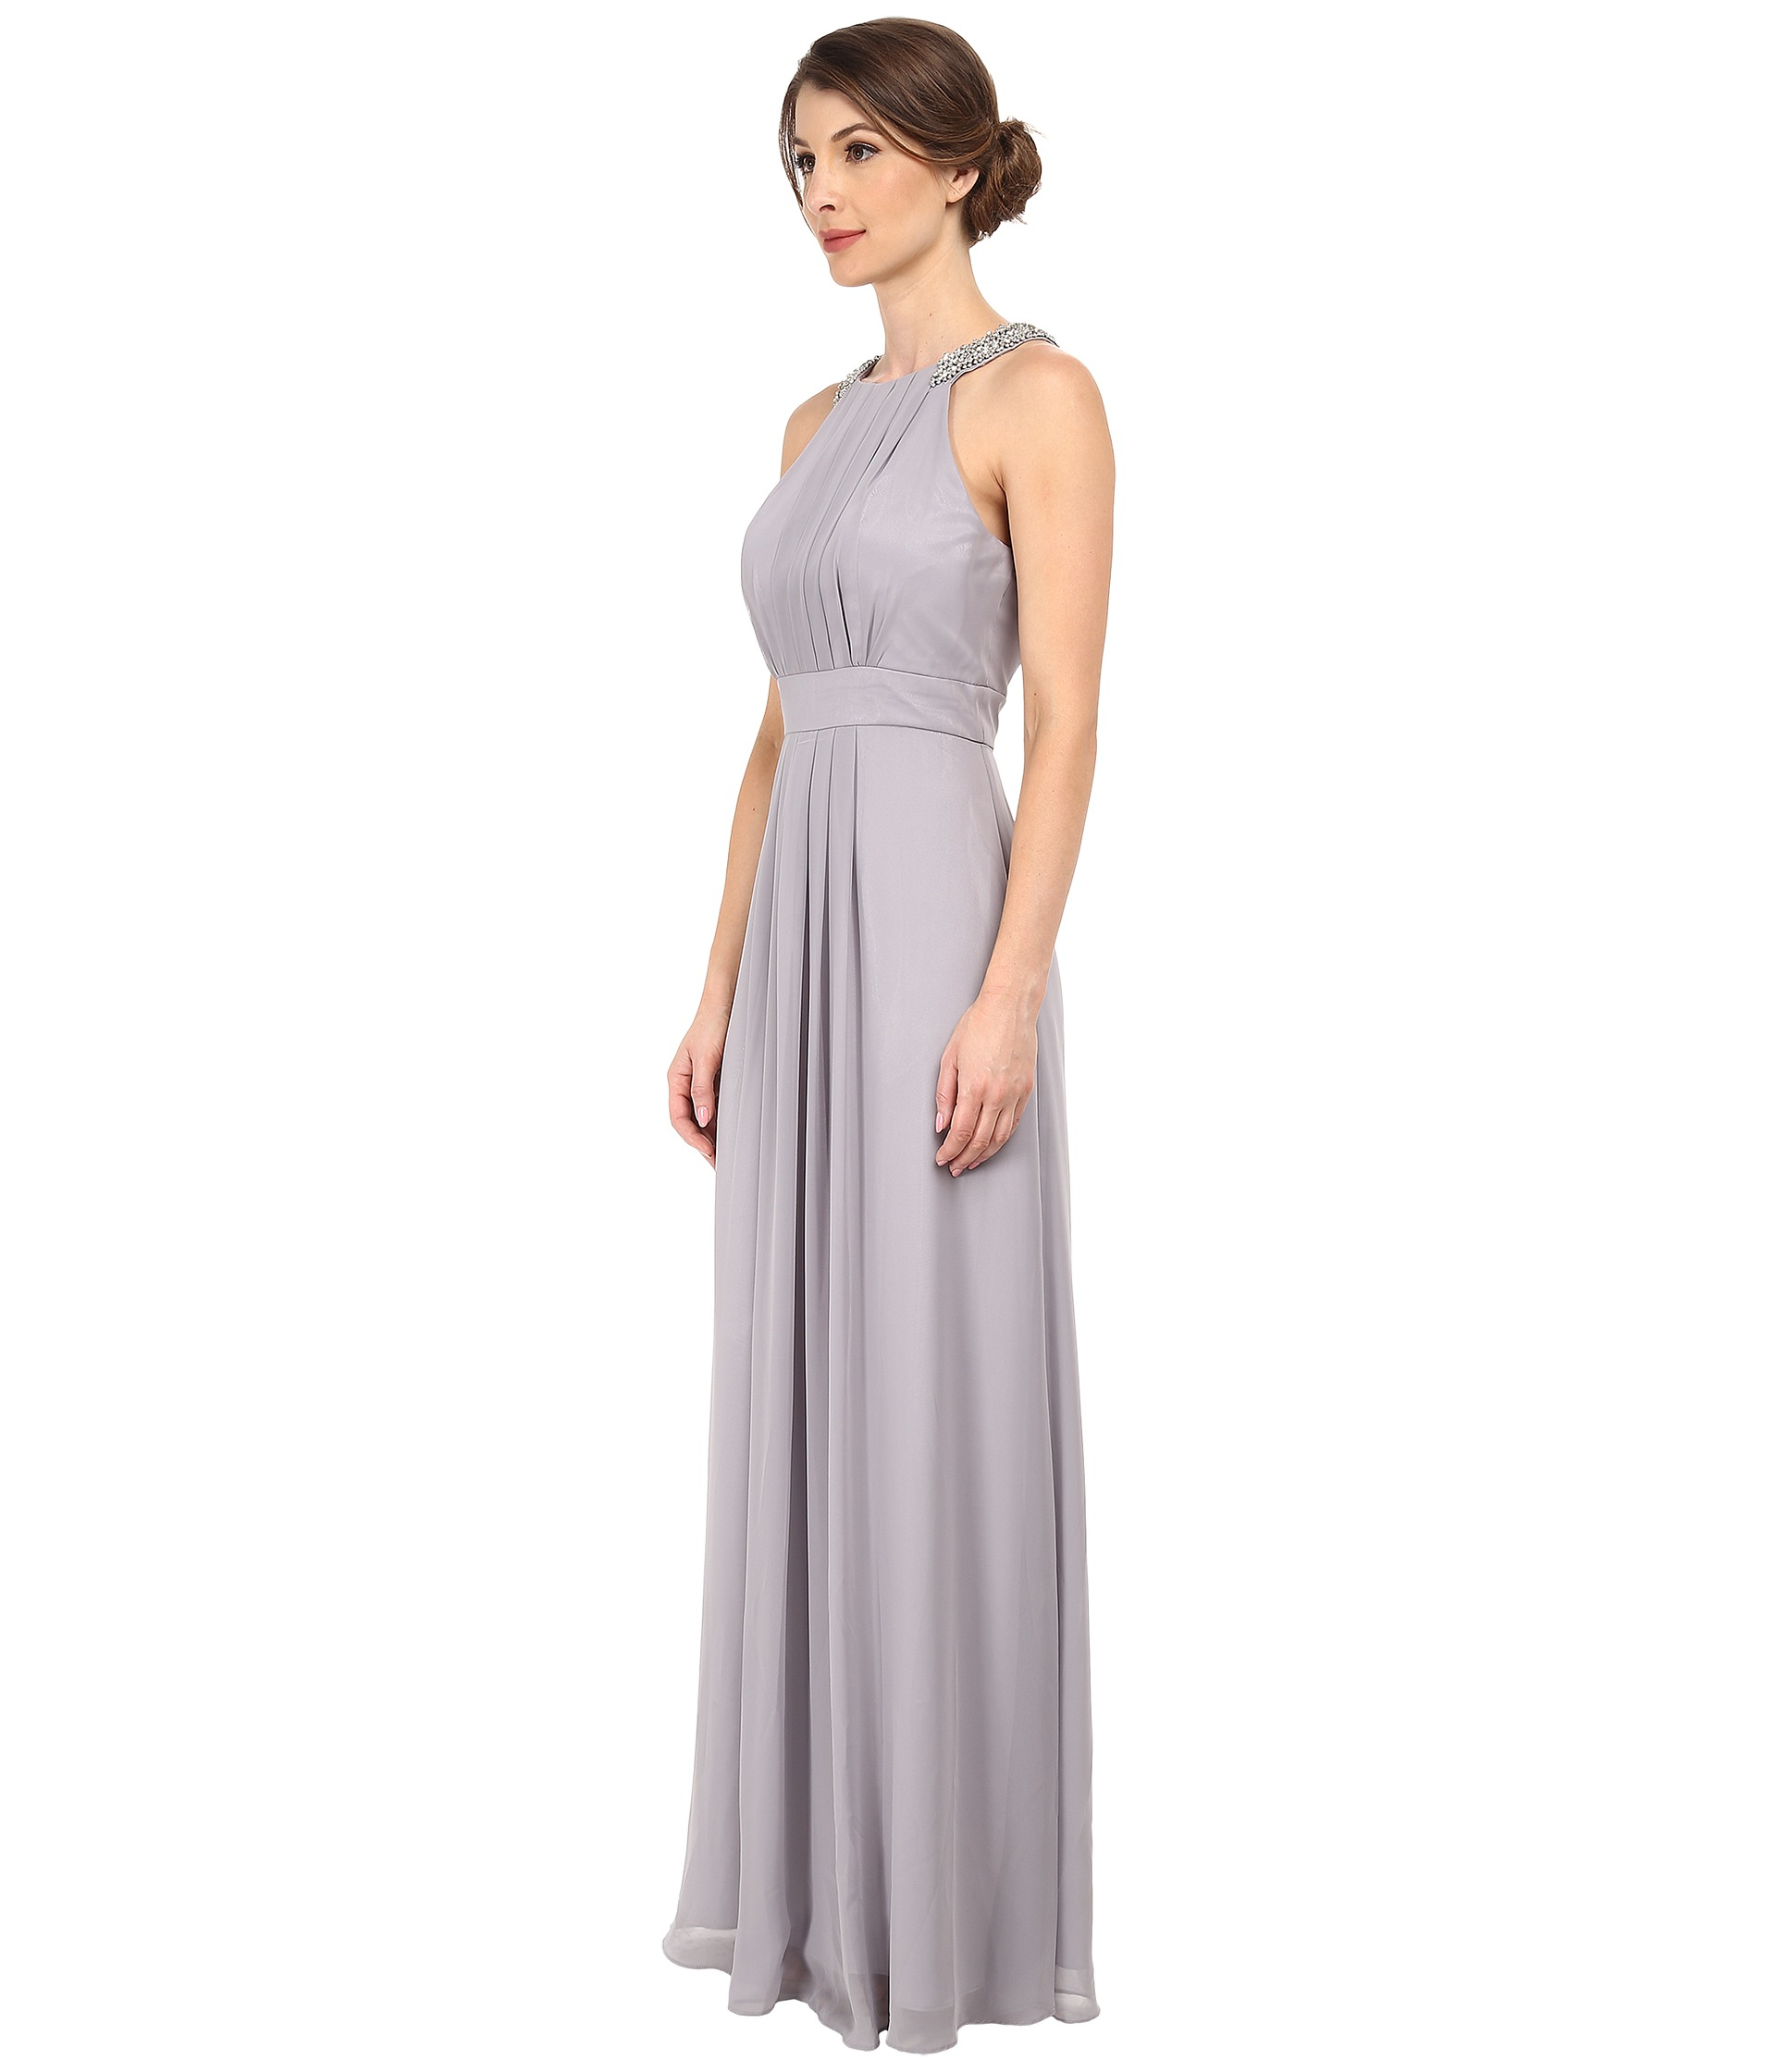 Lyst - Eliza J Chiffon Gown With Beaded Neckband in Metallic